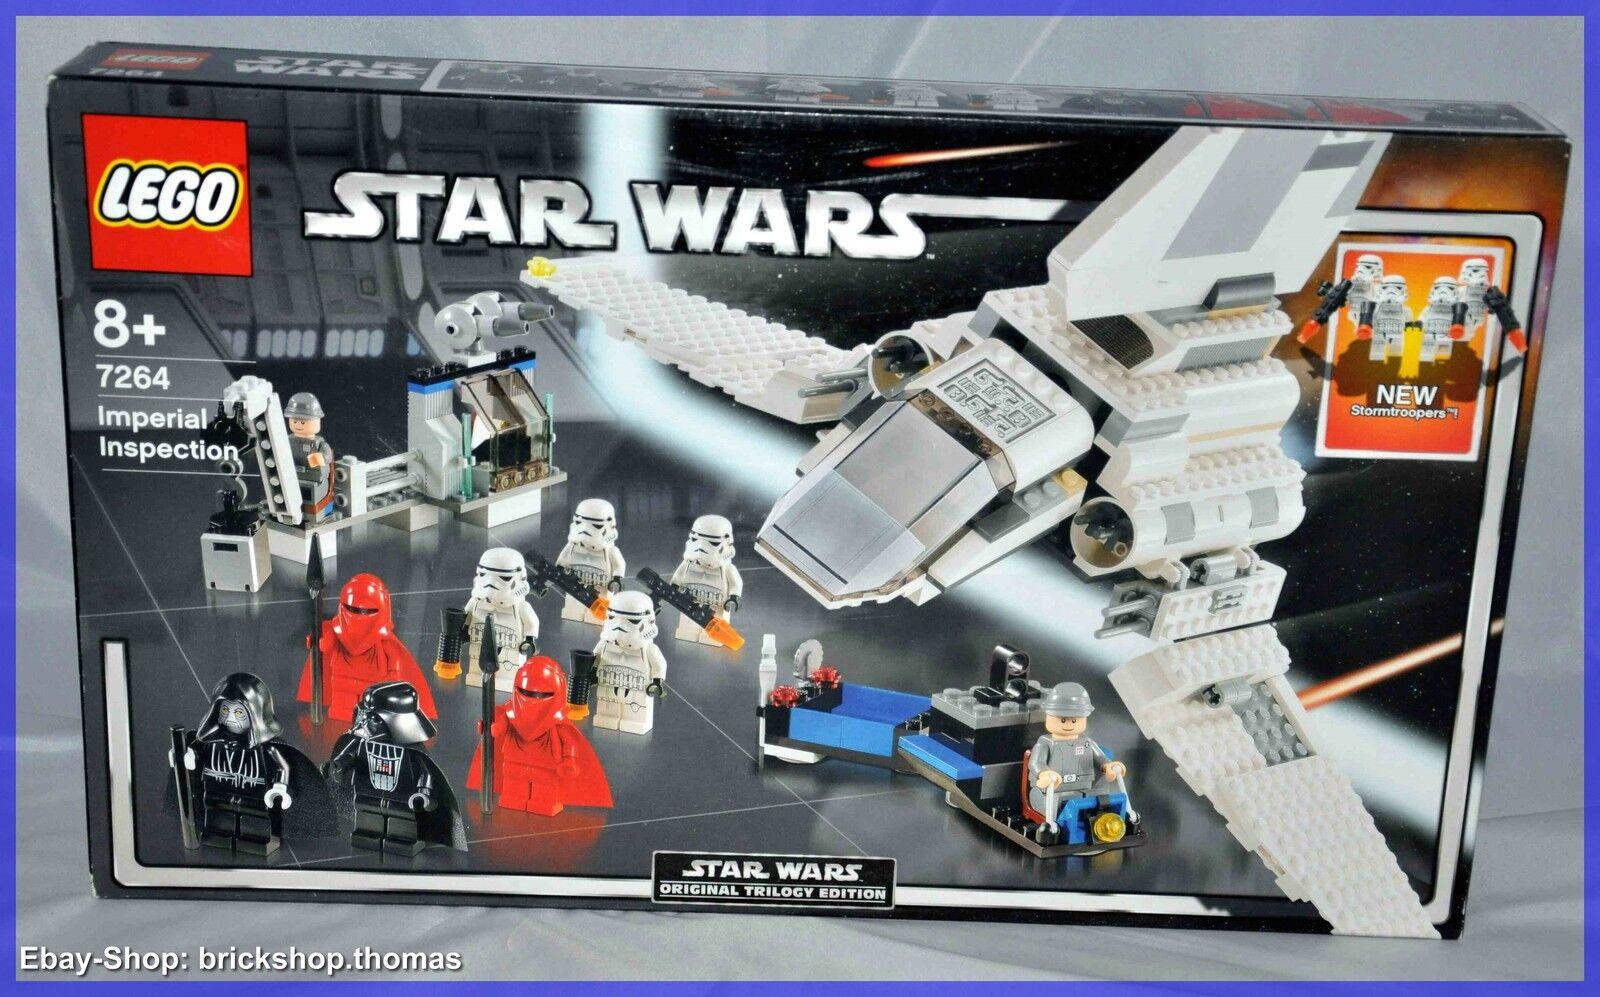 Noël fou saisir saisir saisir grand concours LEGO star wars 7264-Imperial Inspection-article neuf non ouvert 23814e